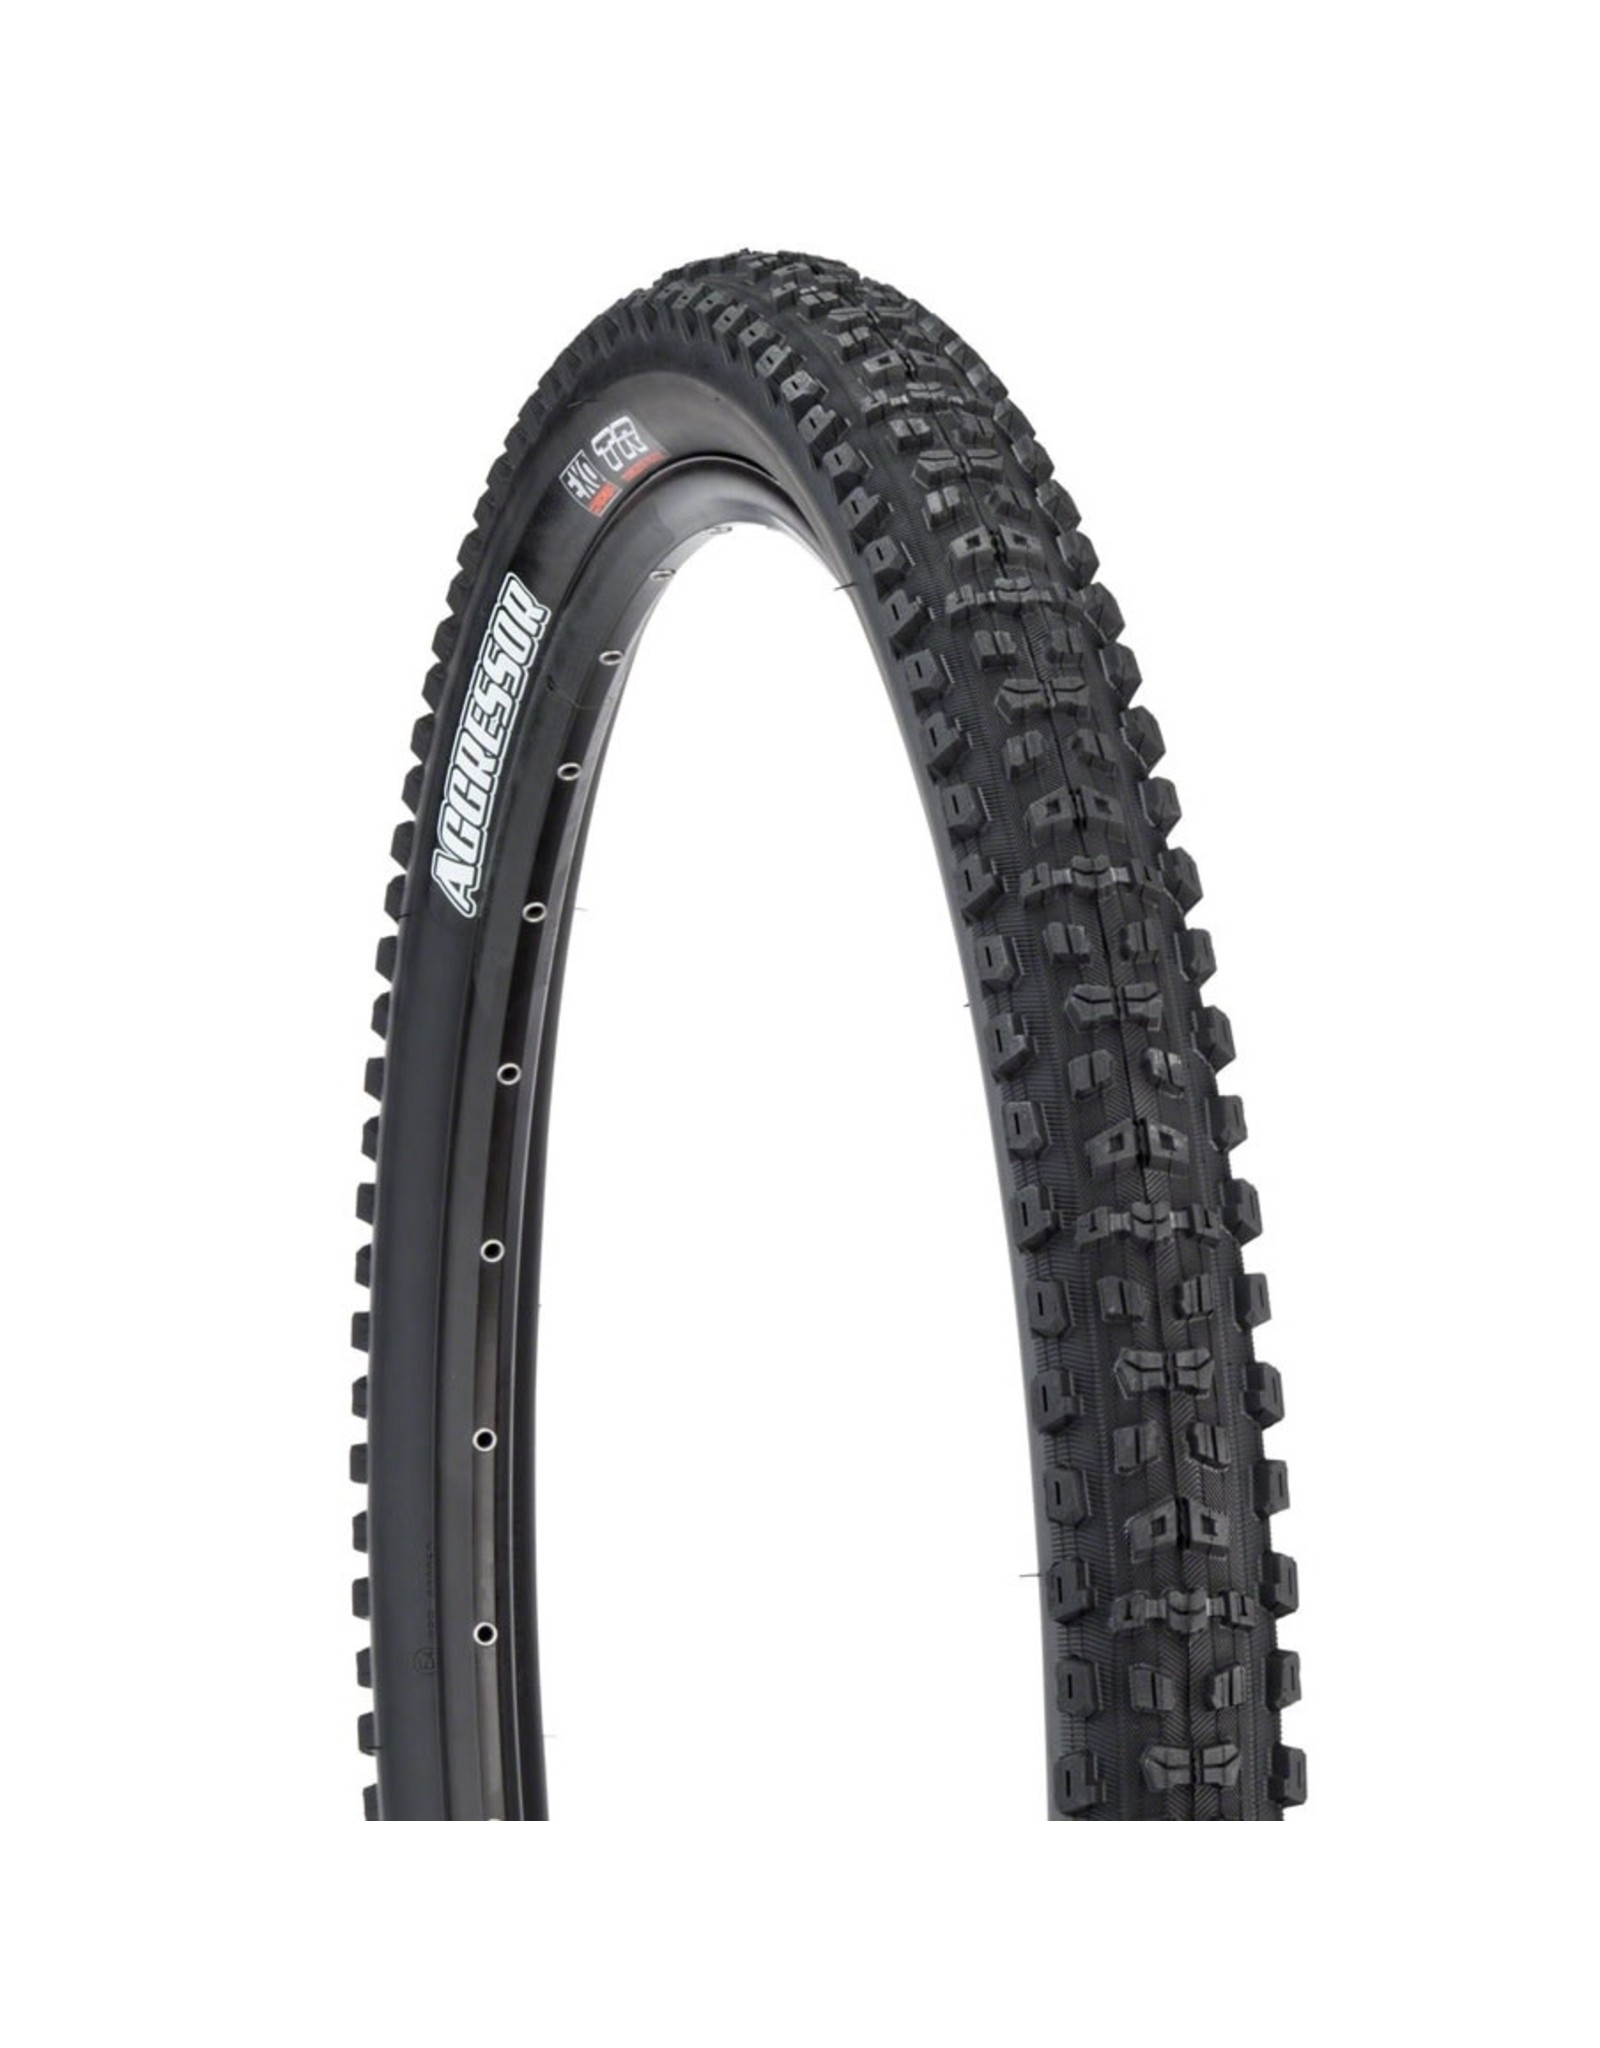 Maxxis Maxxis Aggressor Tire - 27.5 x 2.3, Folding, Tubeless, Black, Dual, EXO